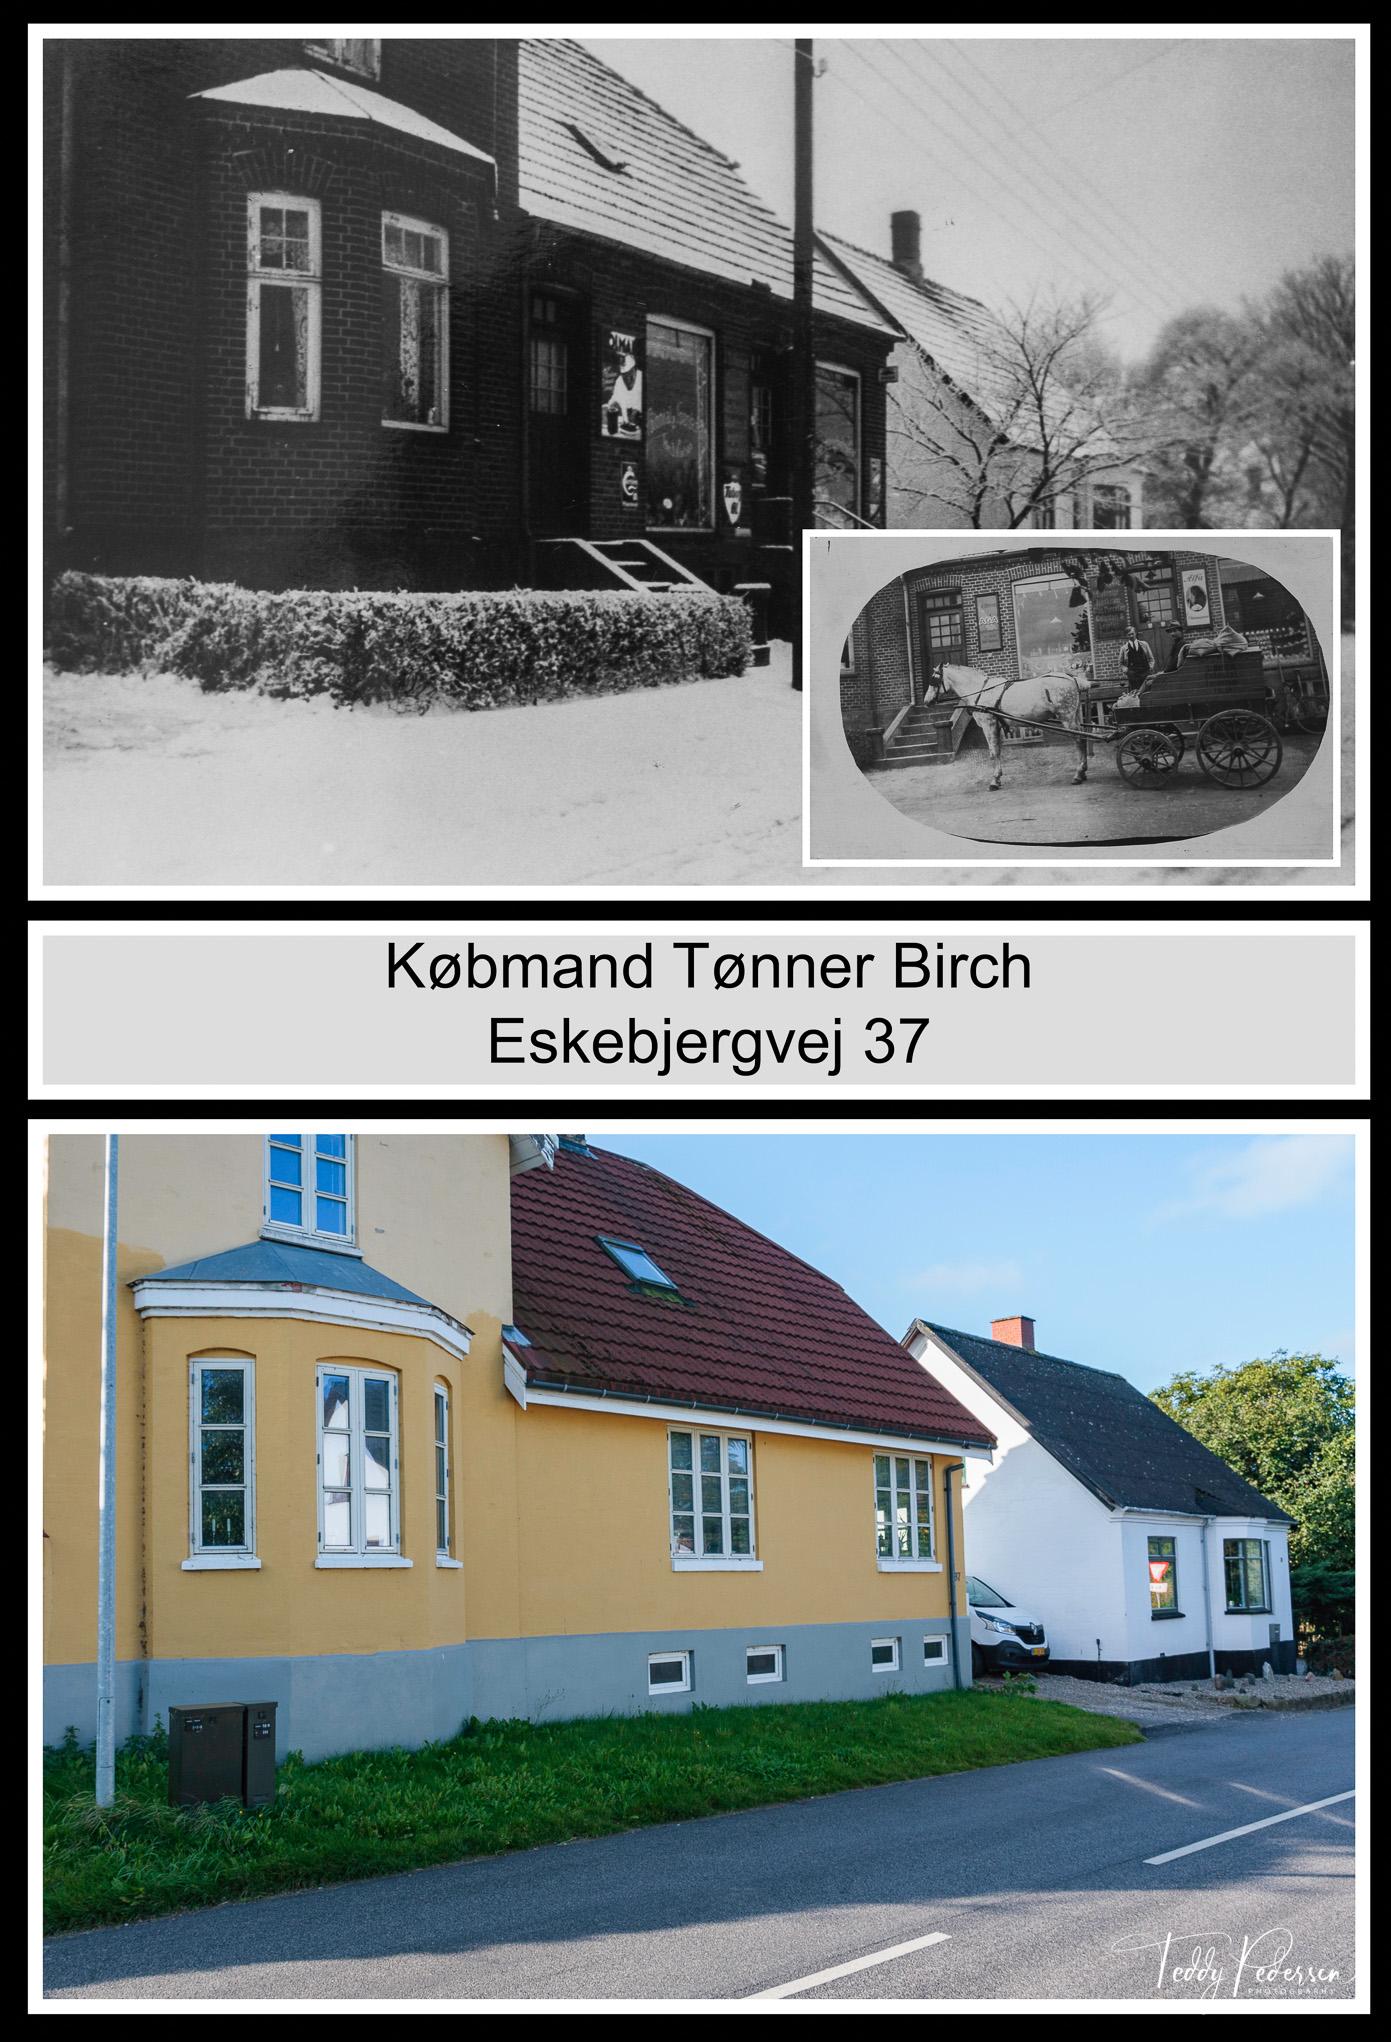 006-018-Gl.-Købmand-Eskebjergvej-37_HighRes_LowRes